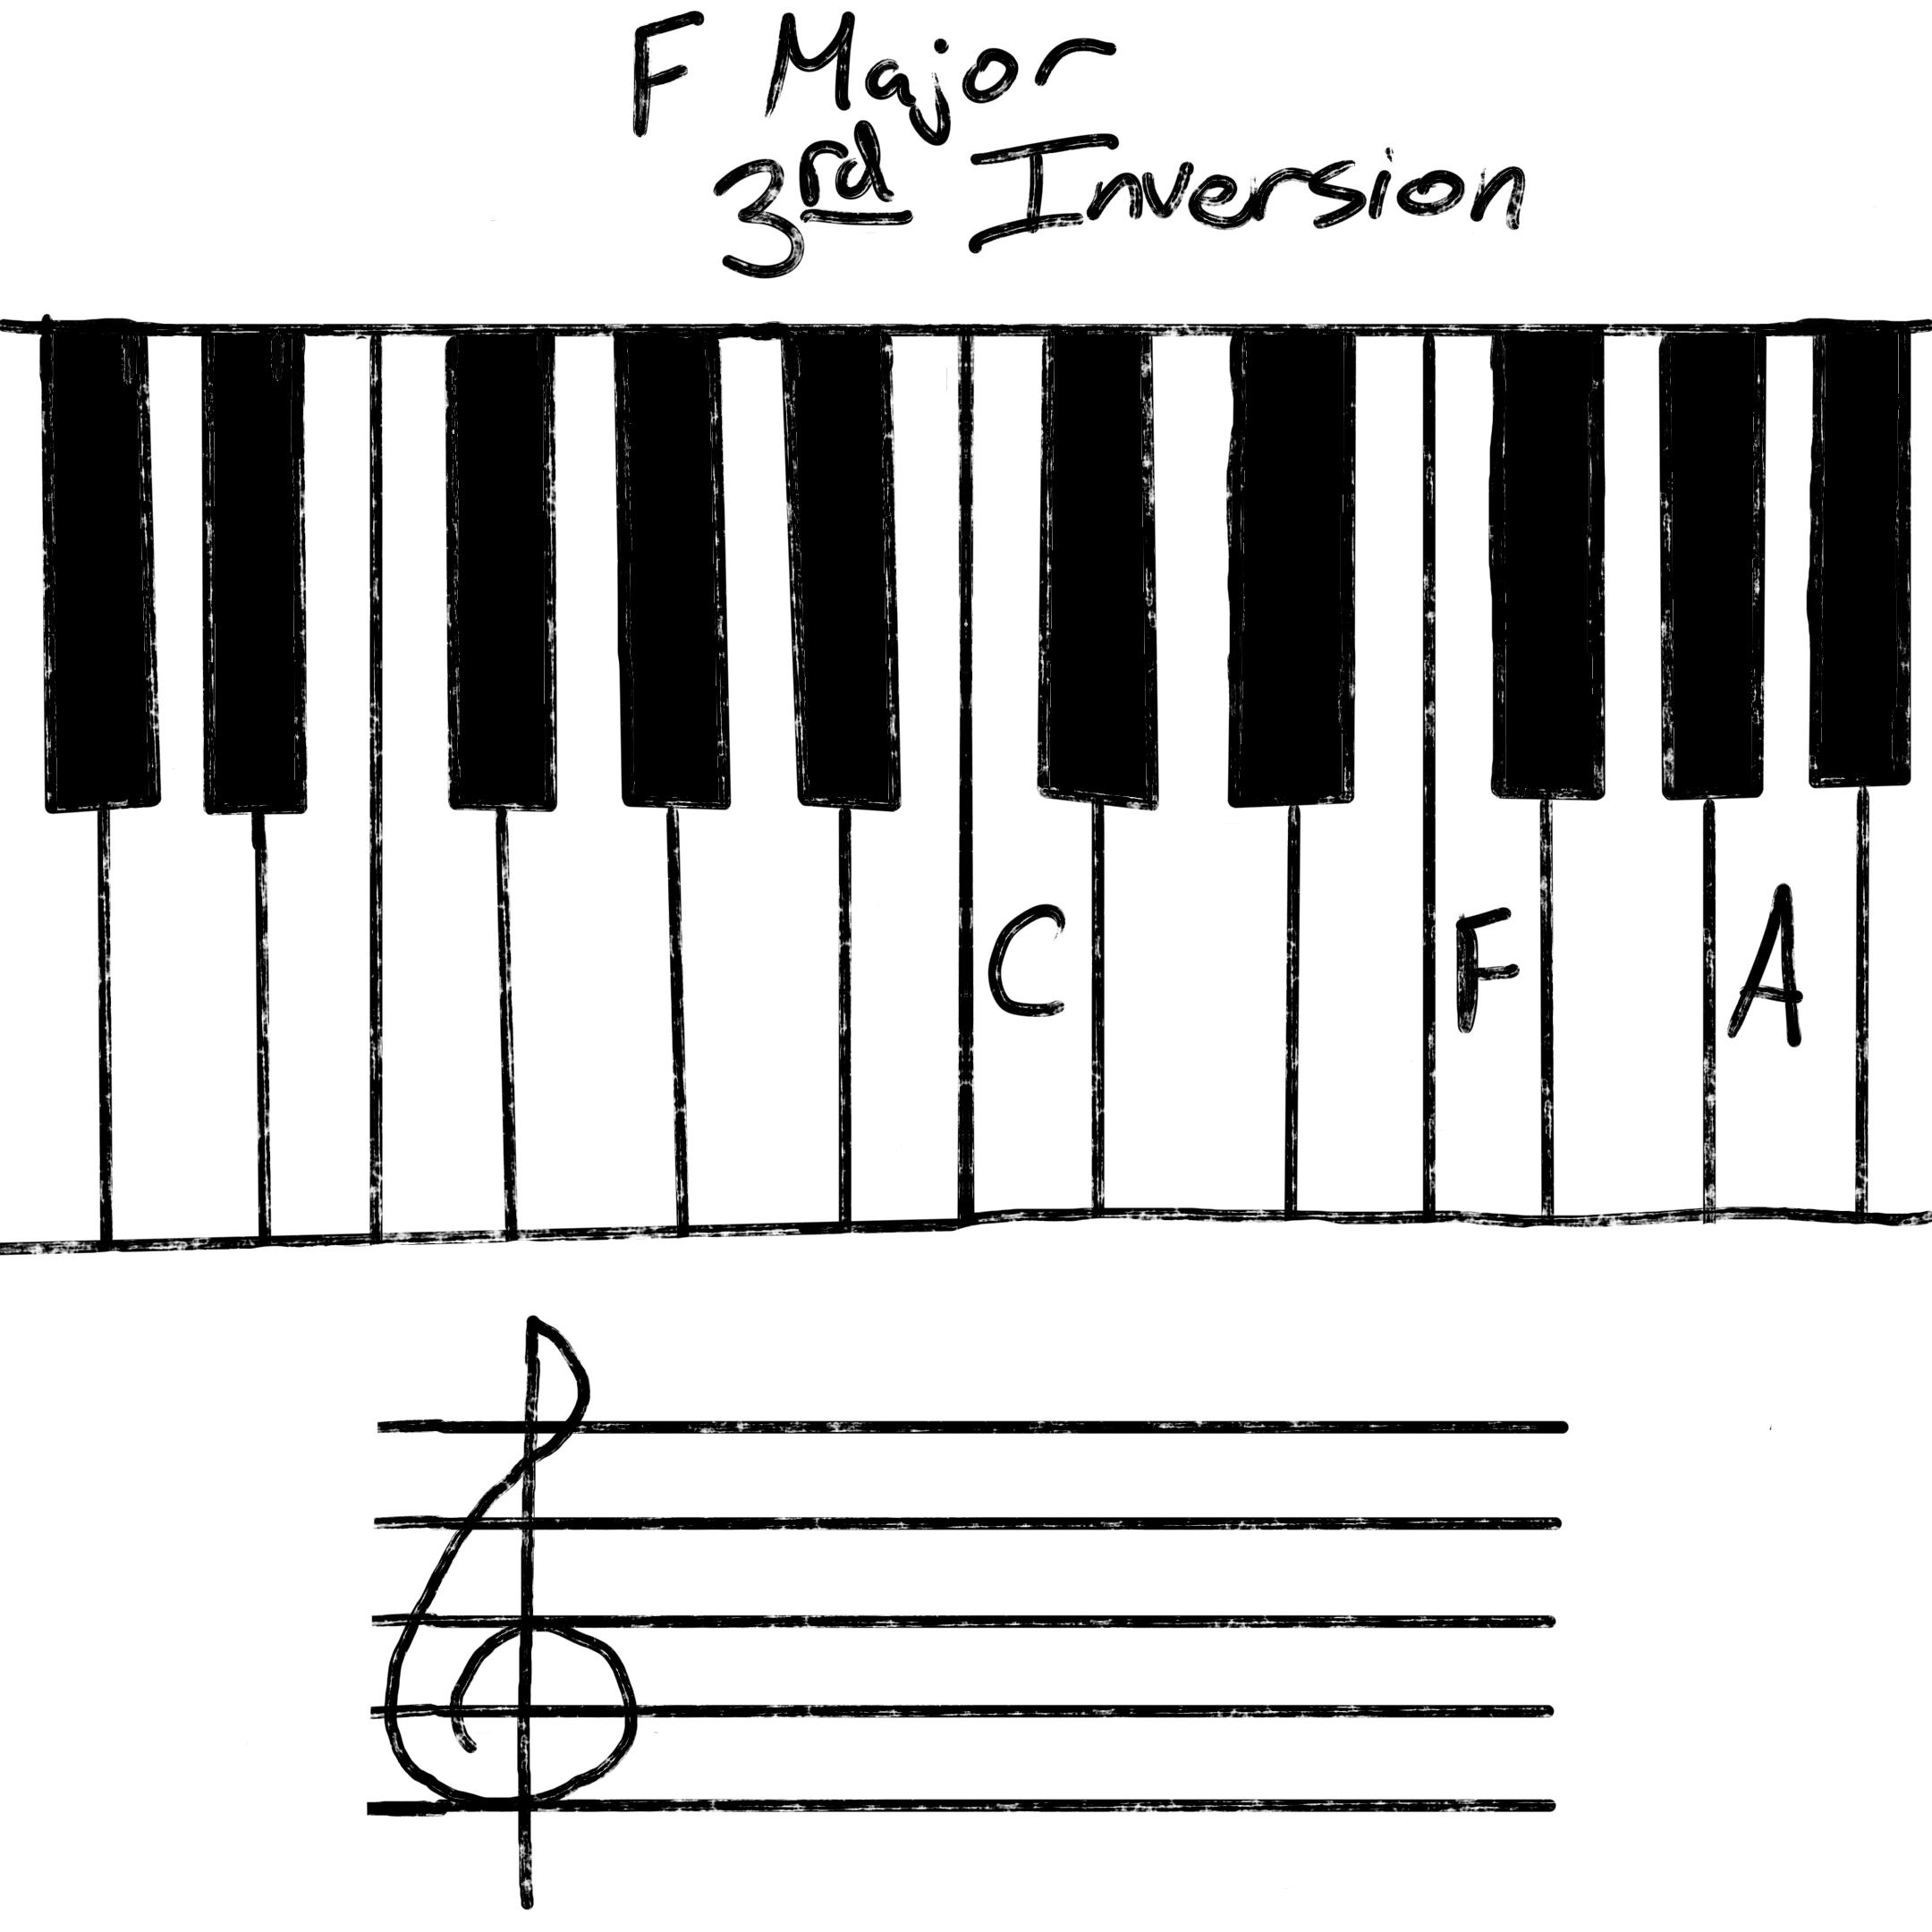 F major third inversion